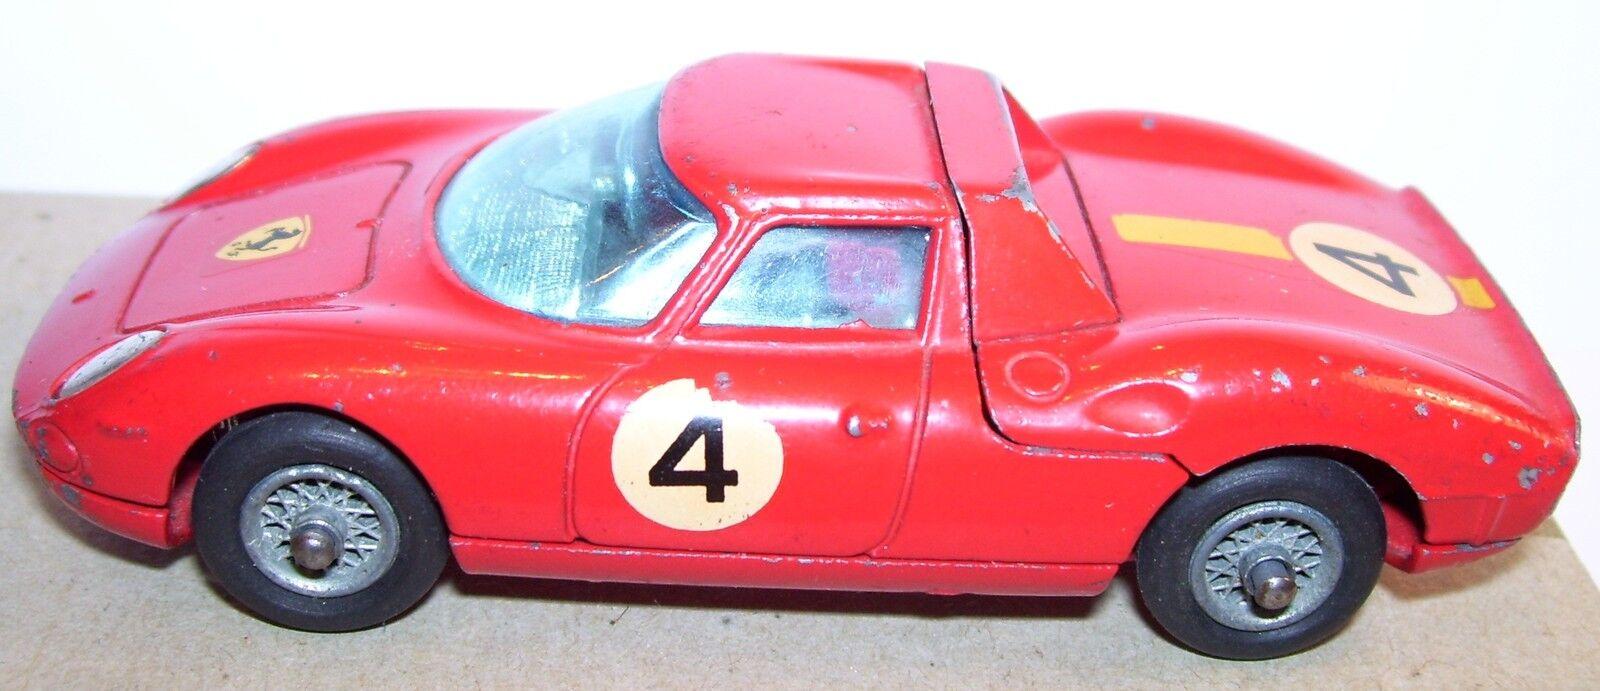 RARE CORGI TOYS FERRARI BERLINETTA 250 LE MANS N°4 REF 314 1965 1 43 GT BRITAIN